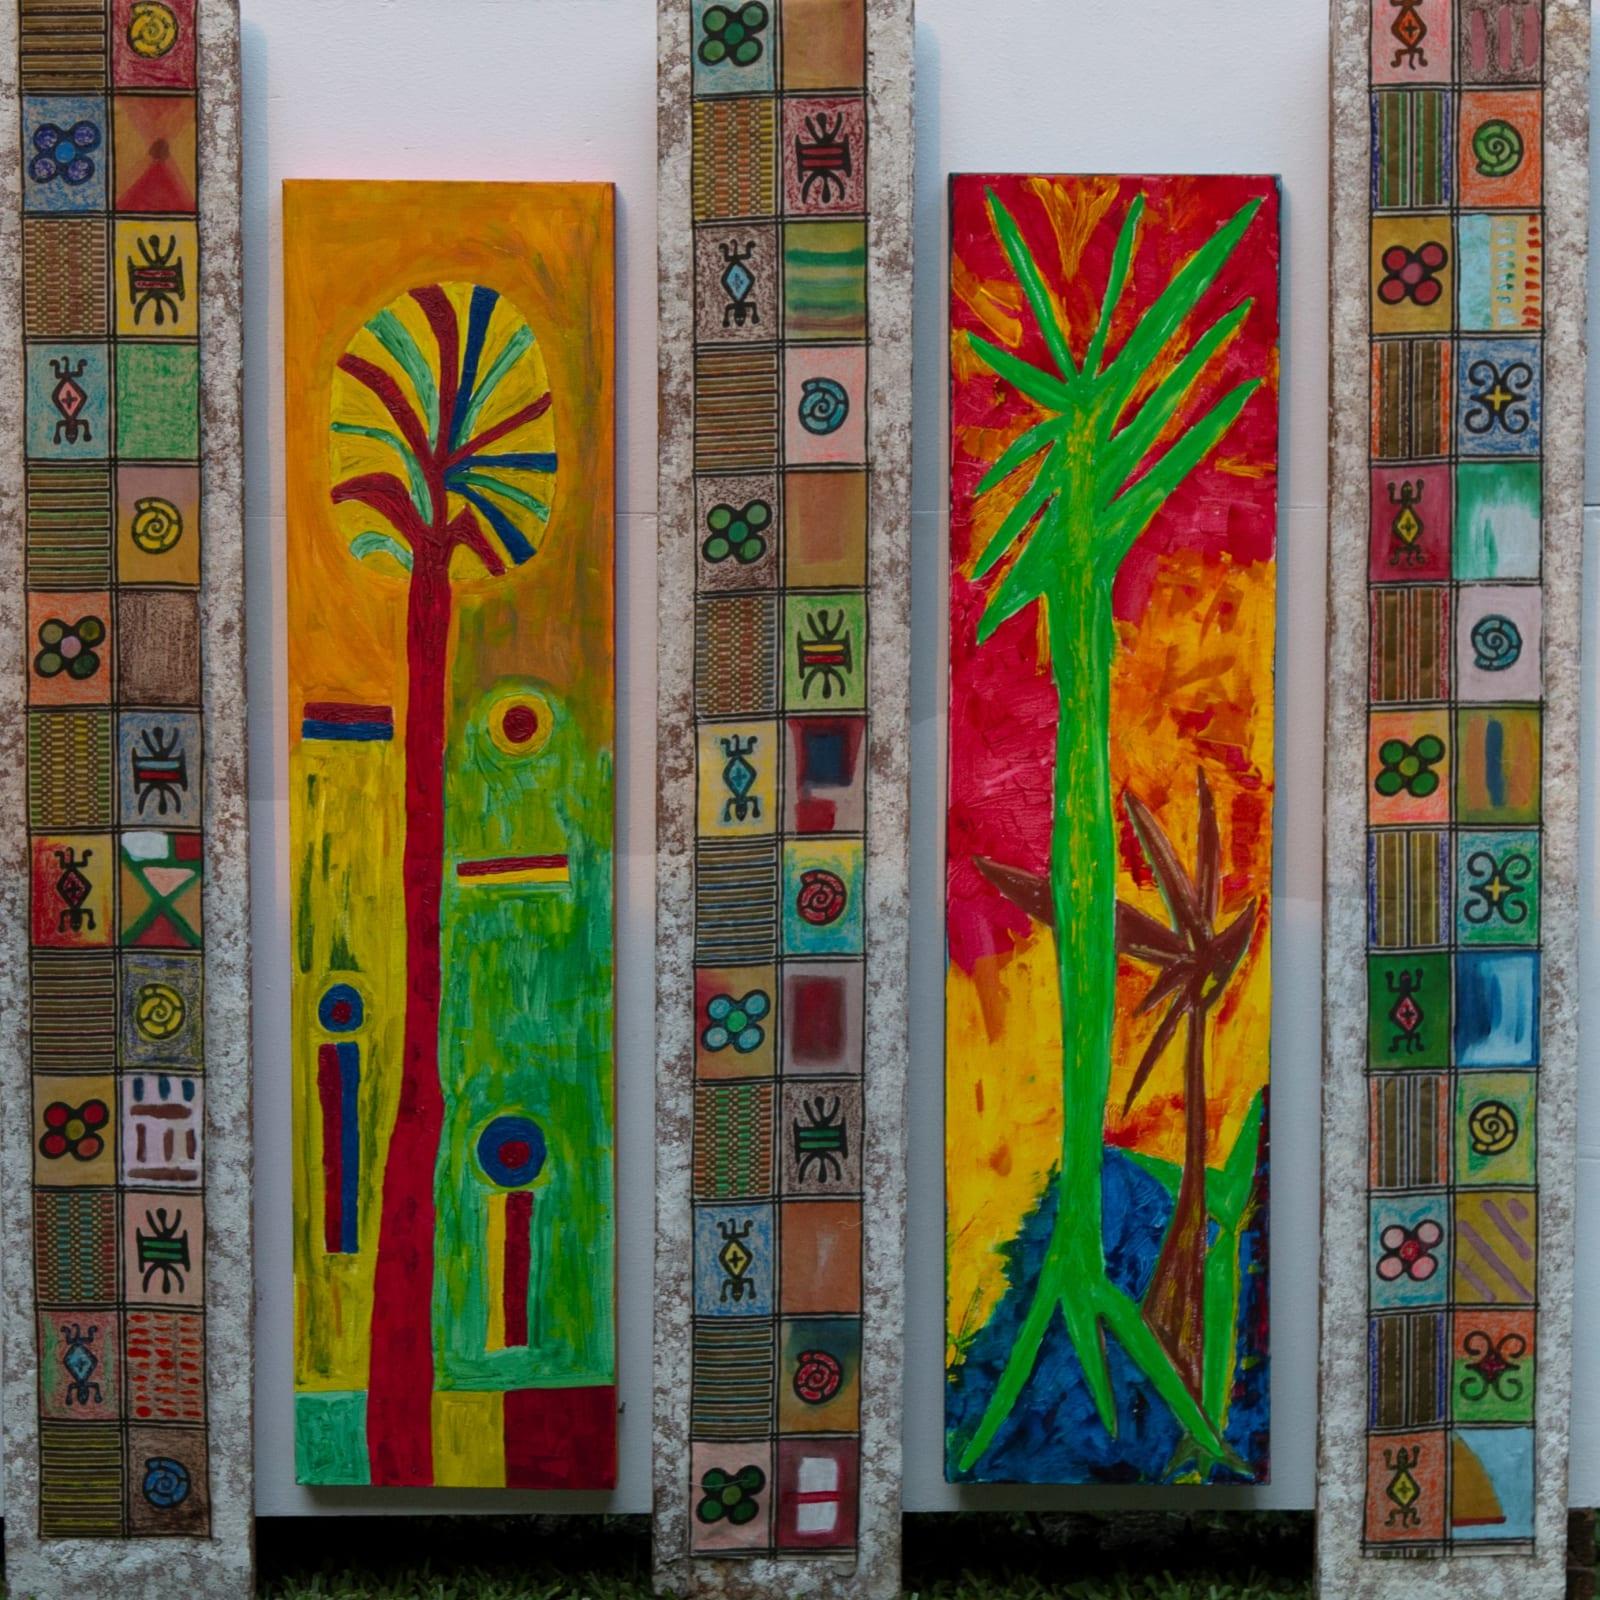 Véronique Tadjo  Petite Forêt Verte, 2020  Mixed media  180 x 152 cm  70 7/8 x 59 7/8 in